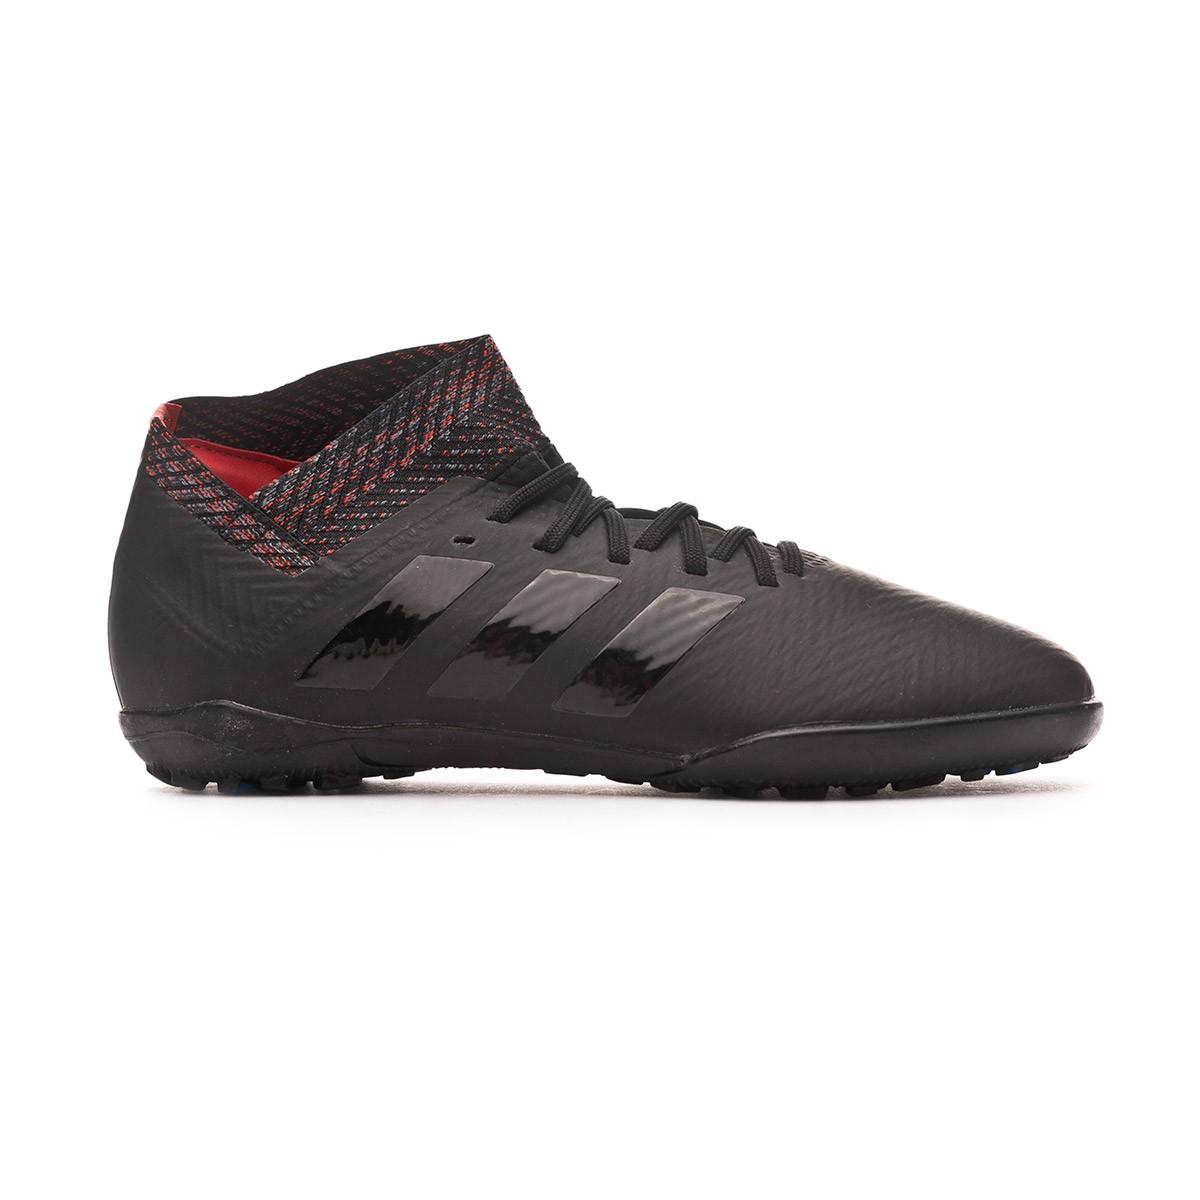 adidas nemeziz tango 18.3 junior astro turf trainers